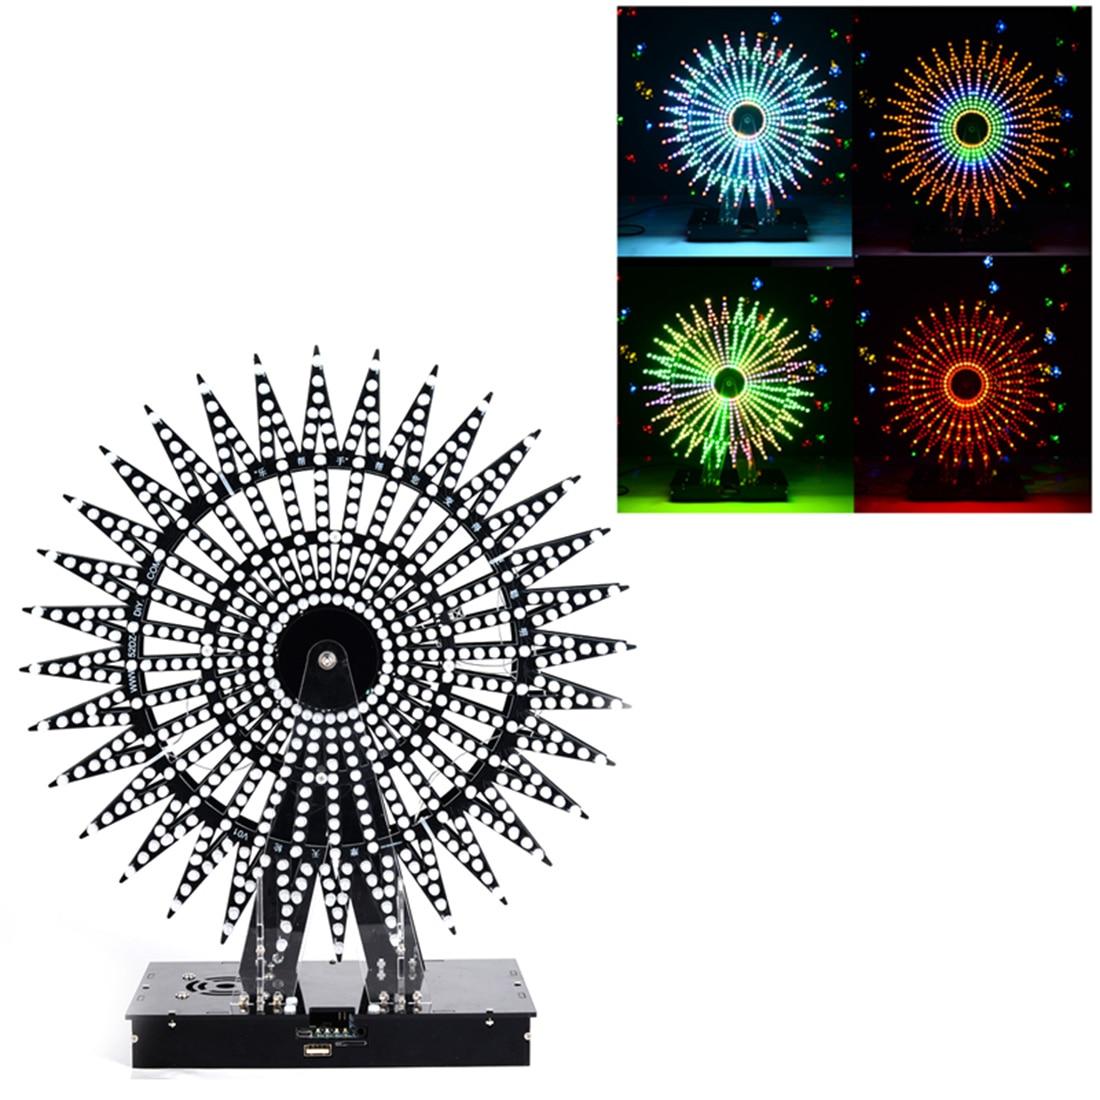 DIY Ferris Wheel Model LED Light Kit Remote Control Music Spectrum Electronic Kit 51 Single-chip LED Kit With Bluetooth Speaker